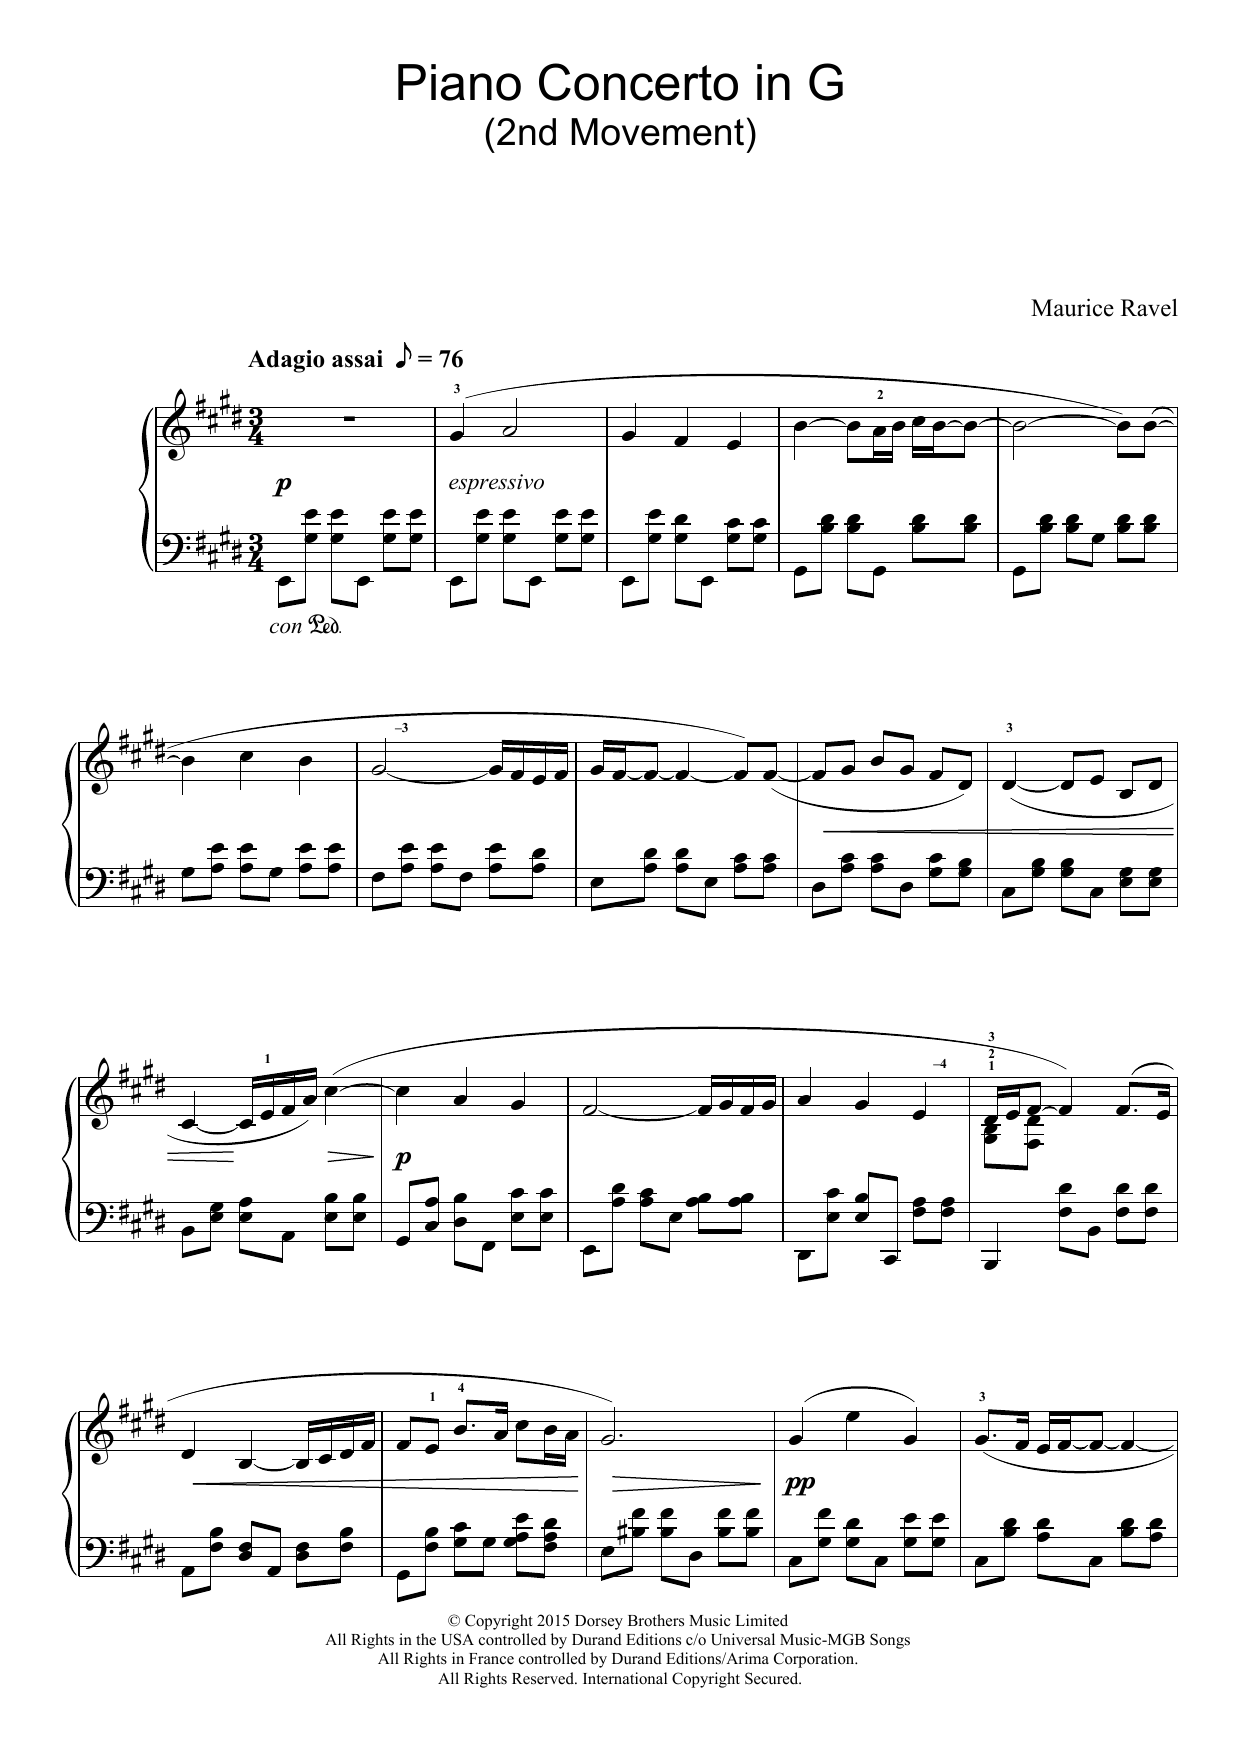 Maurice Ravel - Piano Concerto In G, 2nd Movement 'Adagio Assai'